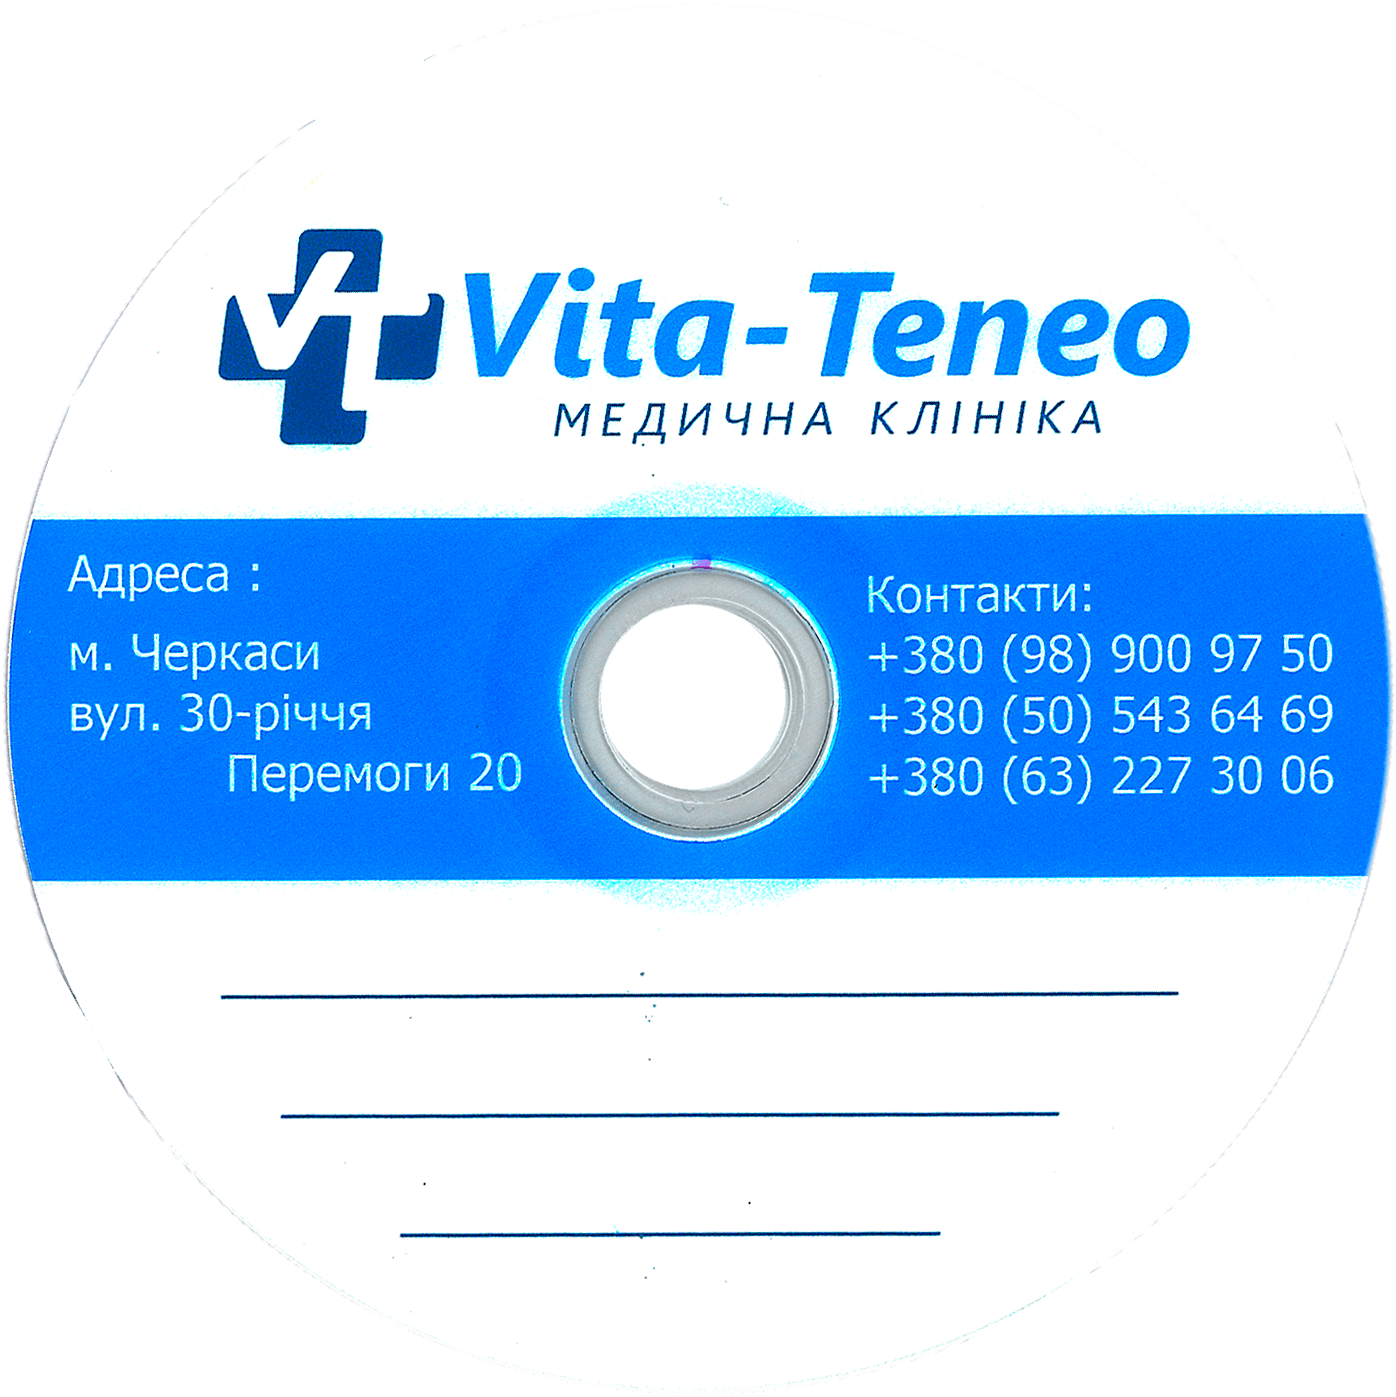 Медицинская клиника МРТ «Vita-Teneo»